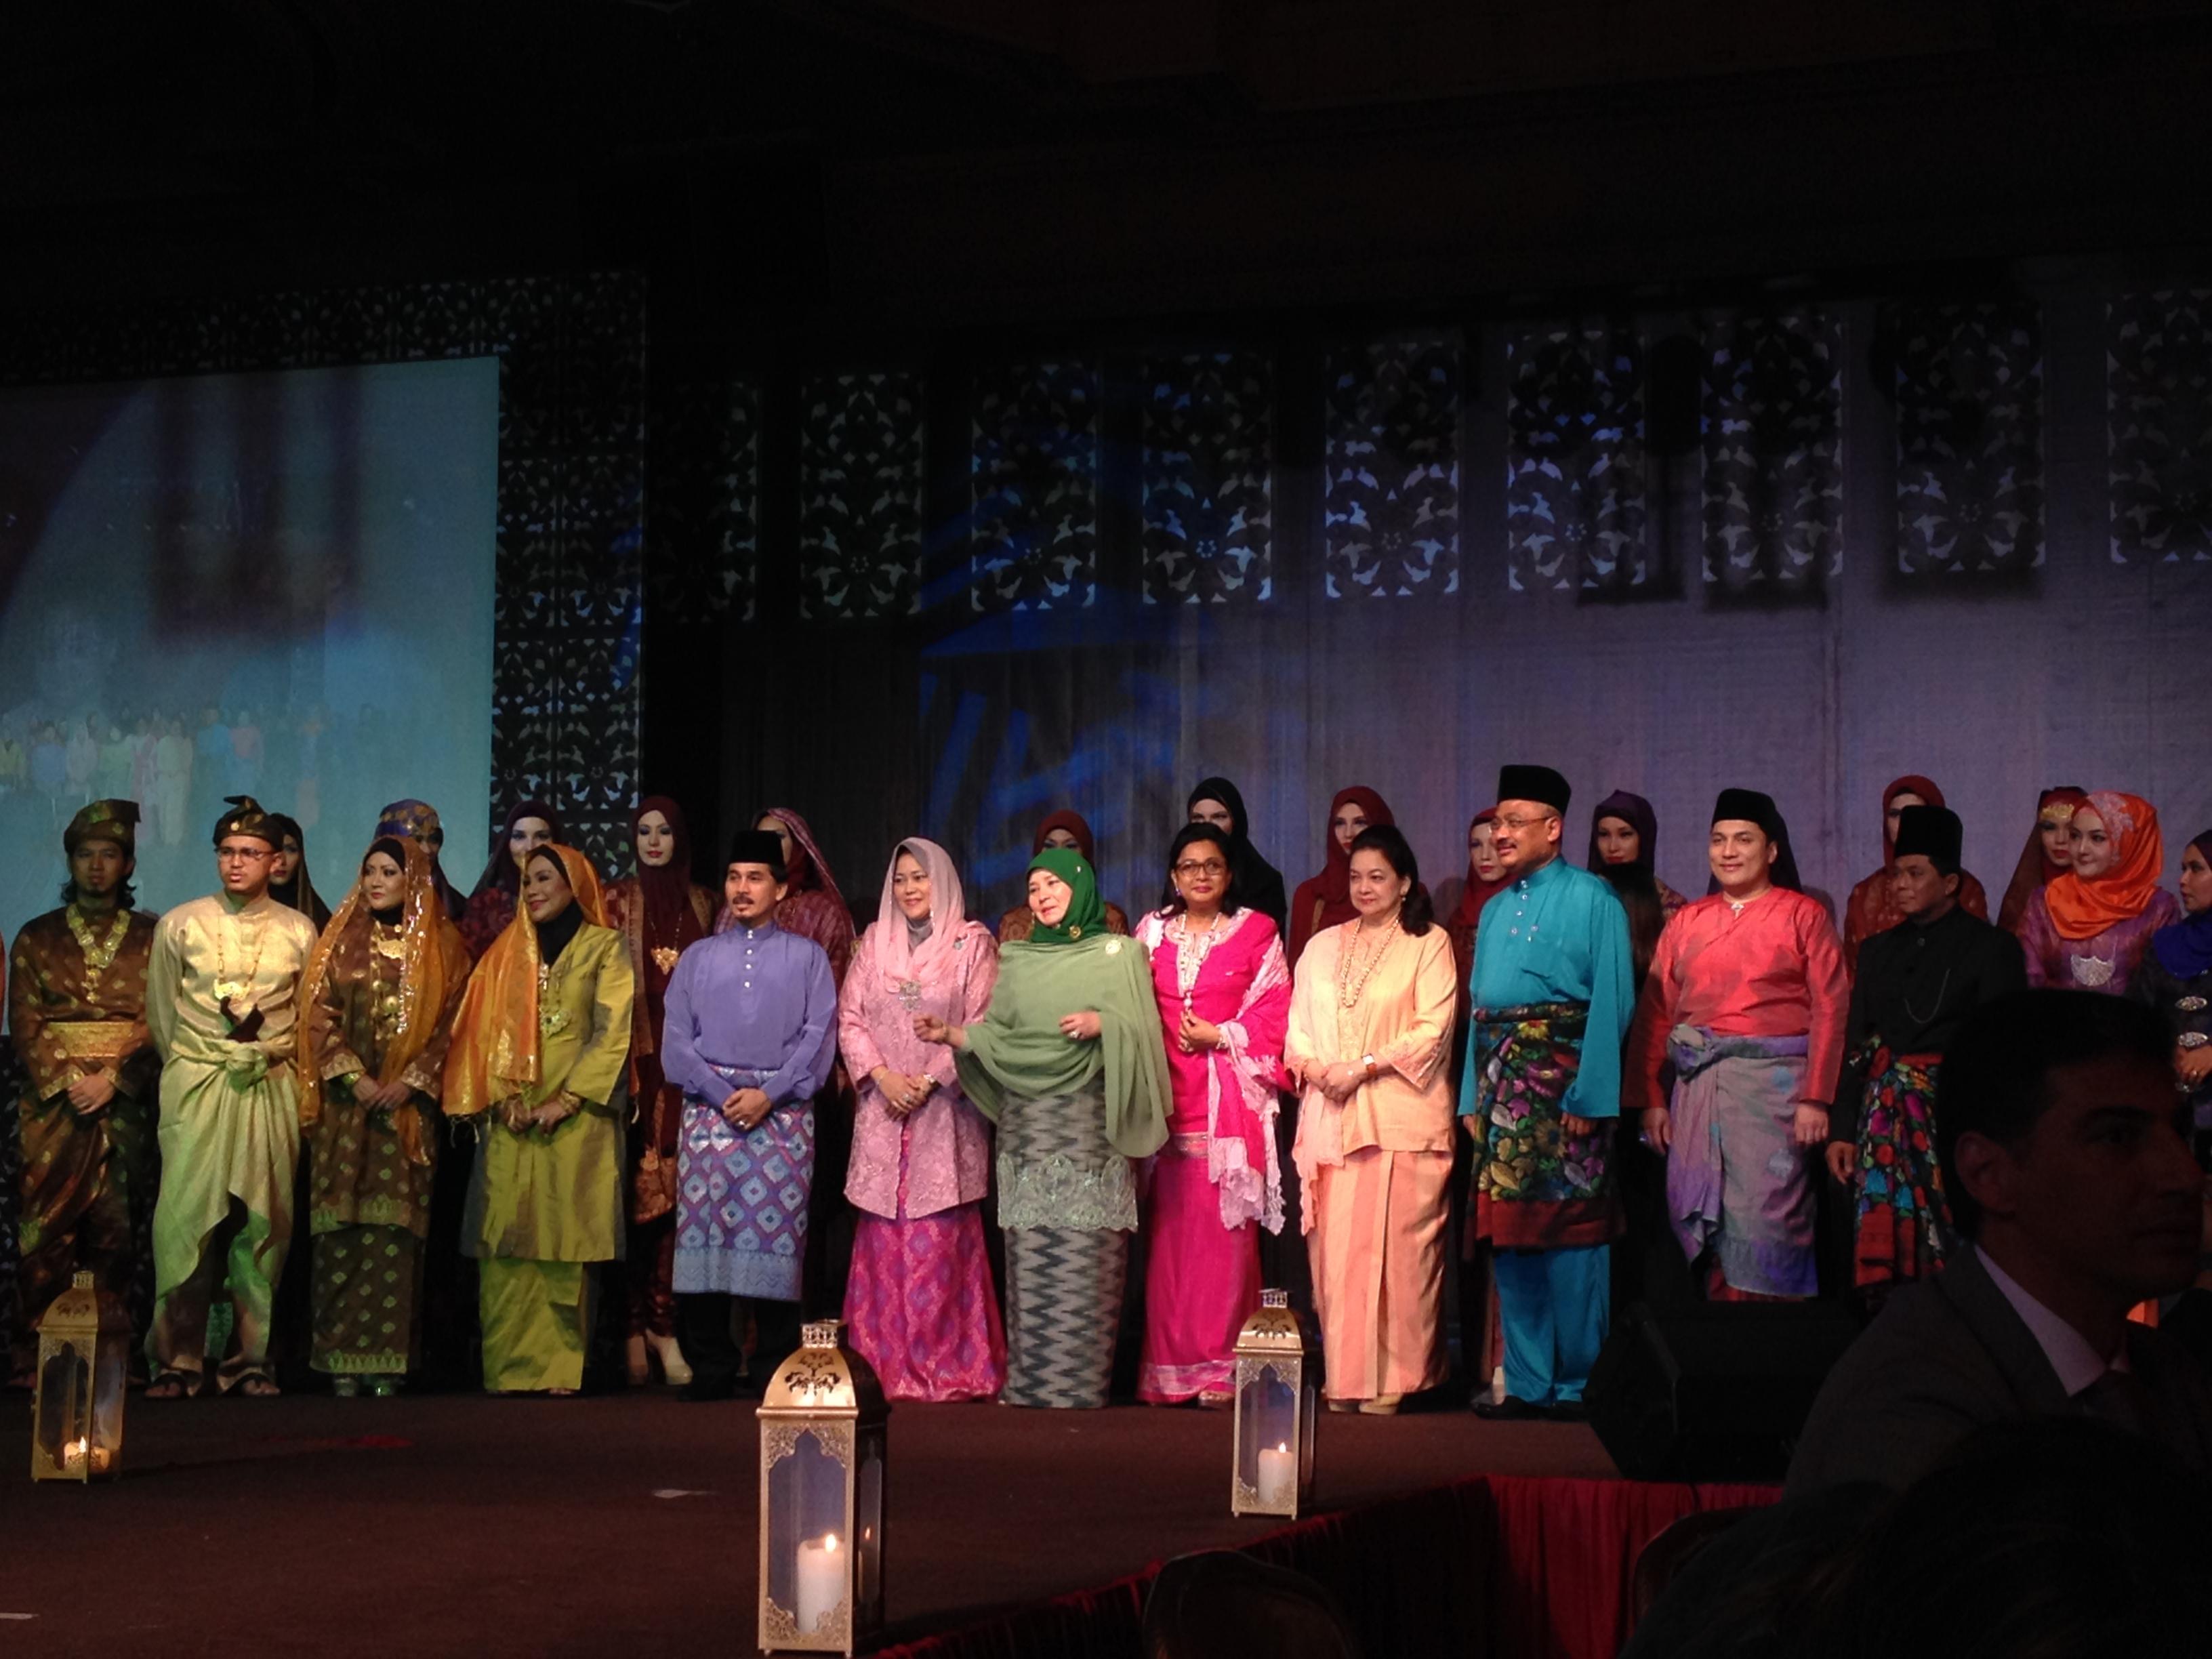 The 2014 Islamic fashion show